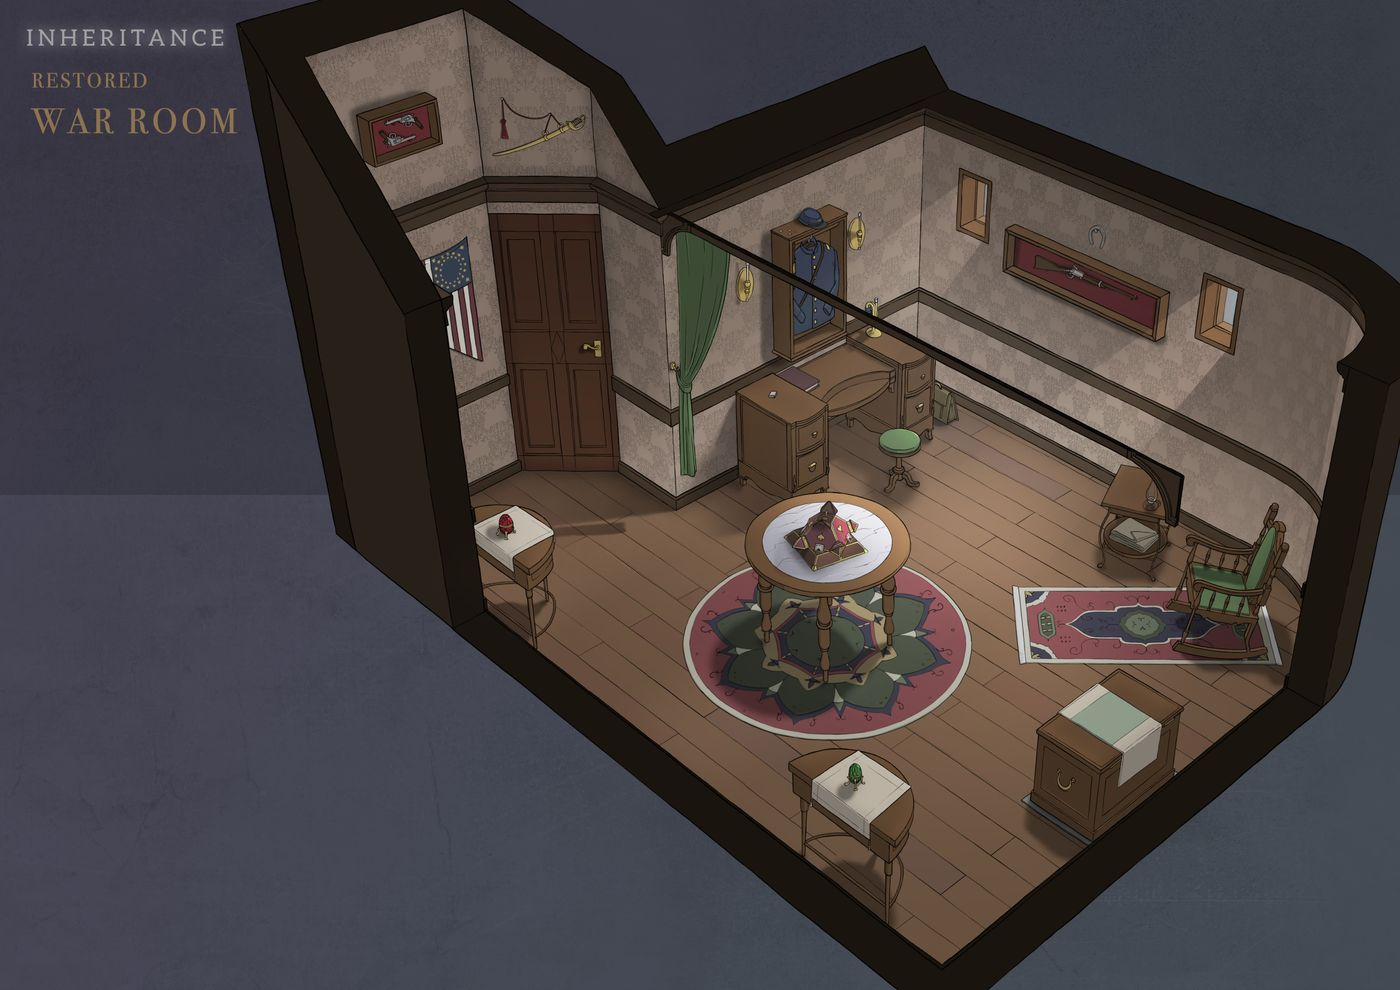 Inheritance Crrdesign.restored War Room.chris Rogers.jpg%281%29